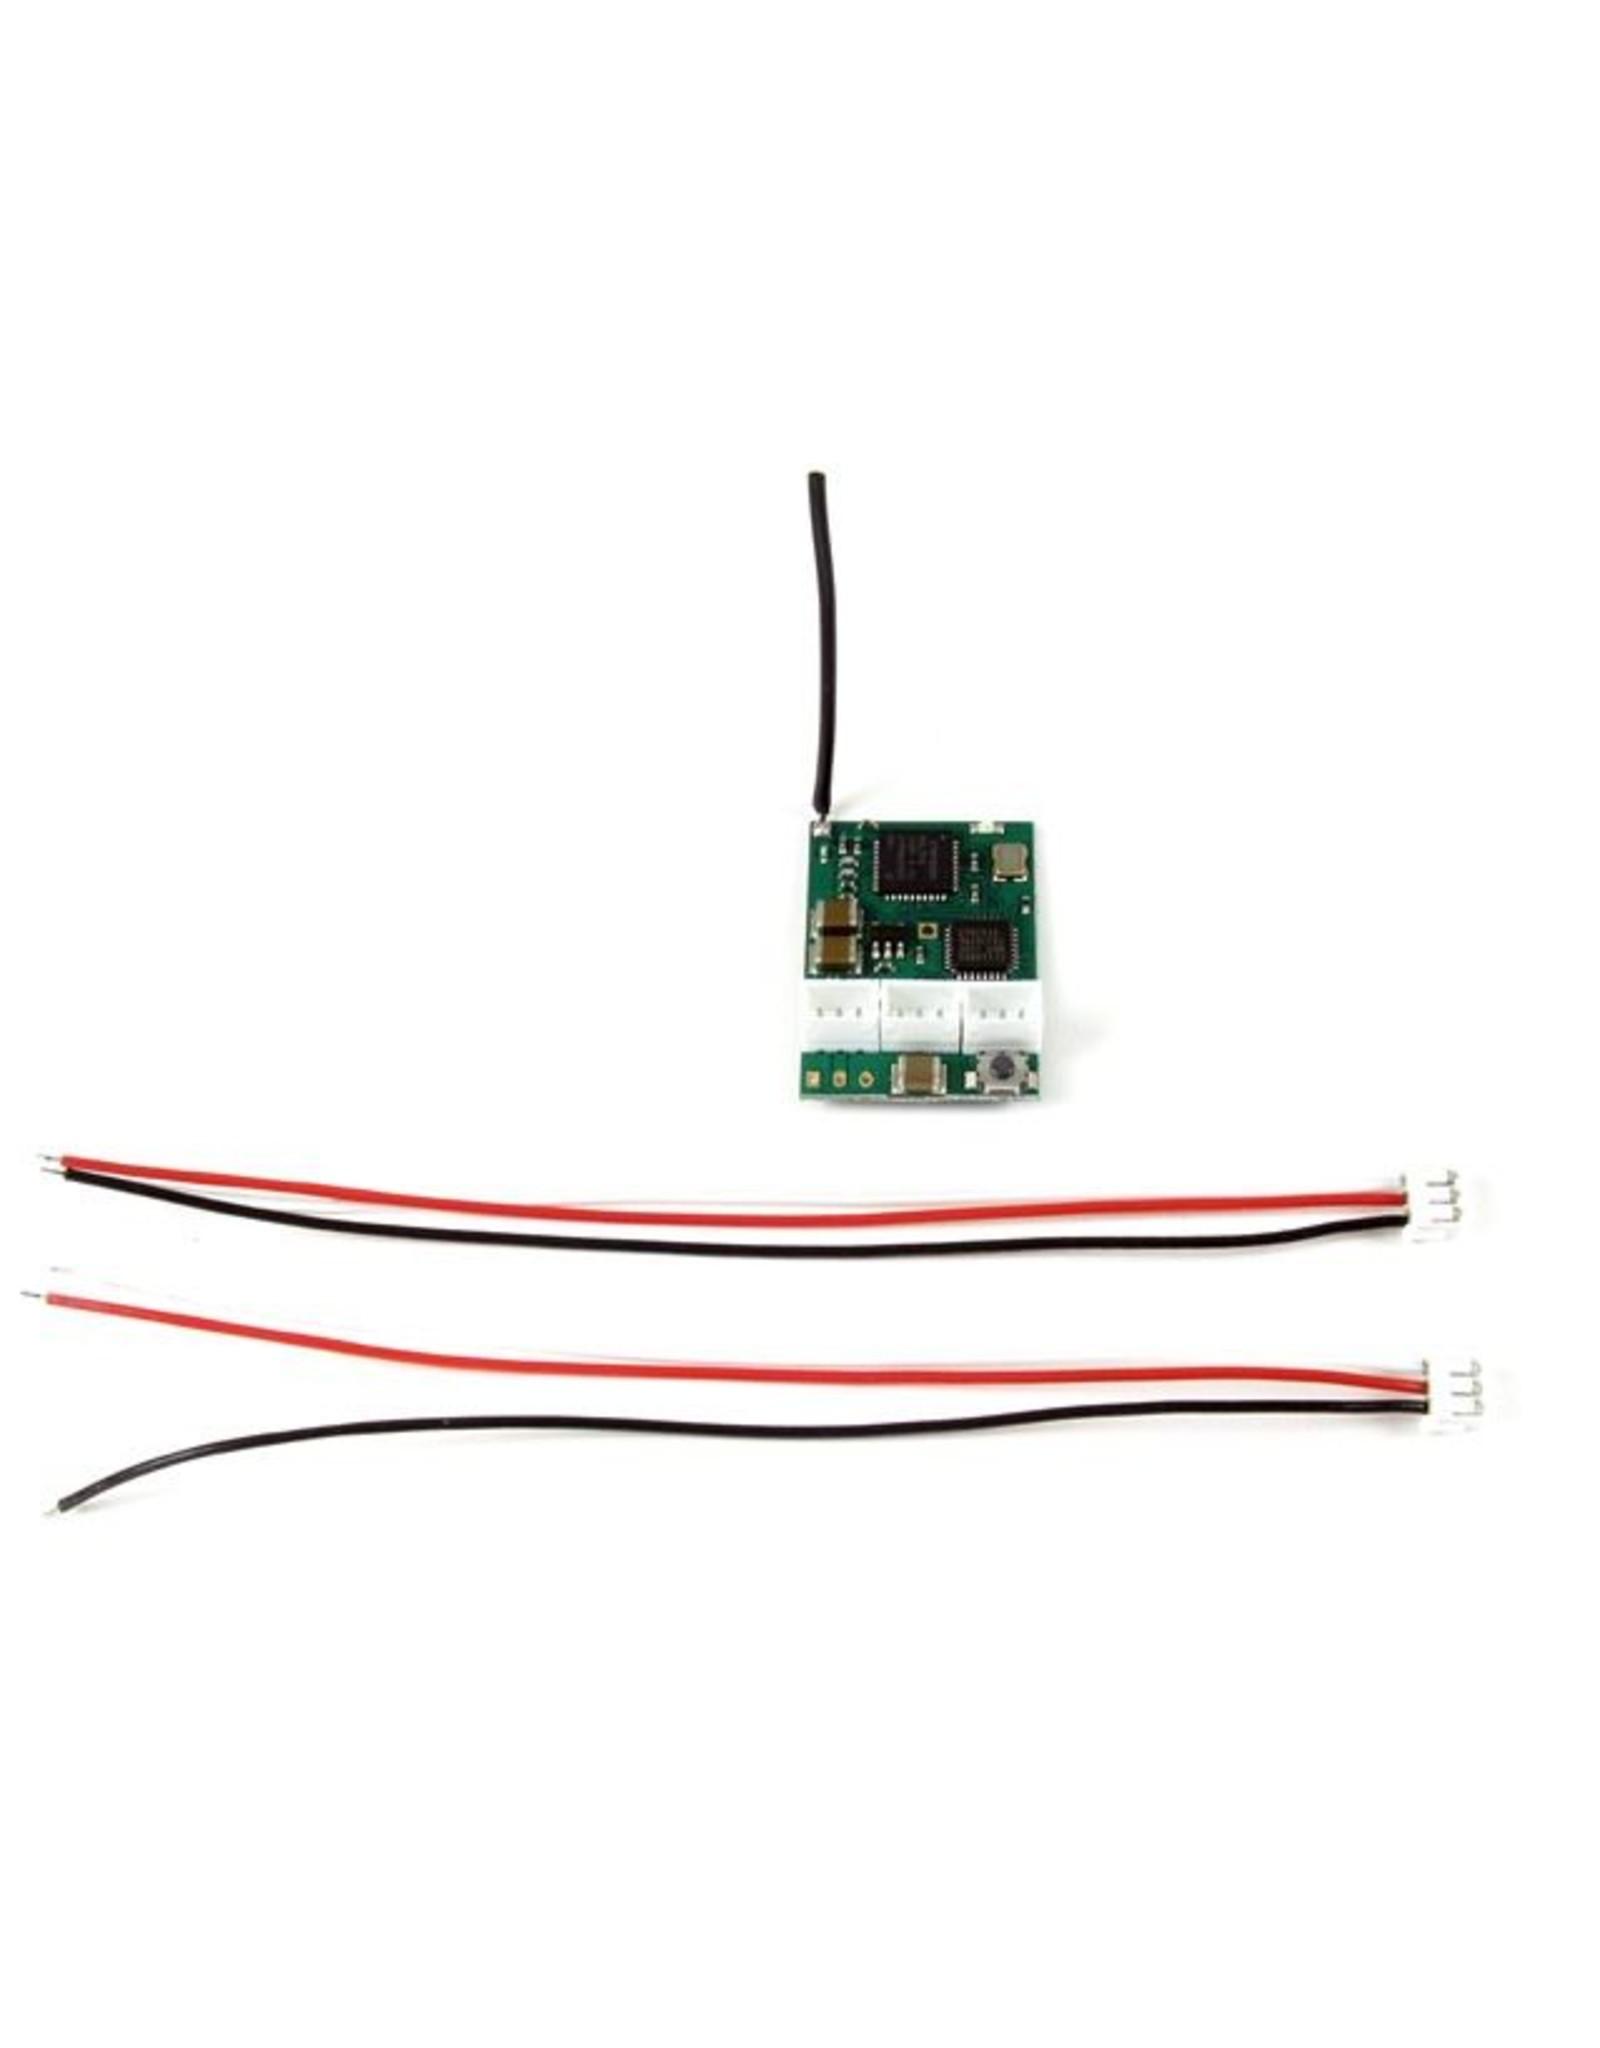 PN Racing PN Racing 2.4Ghz 3Ch Micro Receiver Compat Spektrum DSM2 (500806)